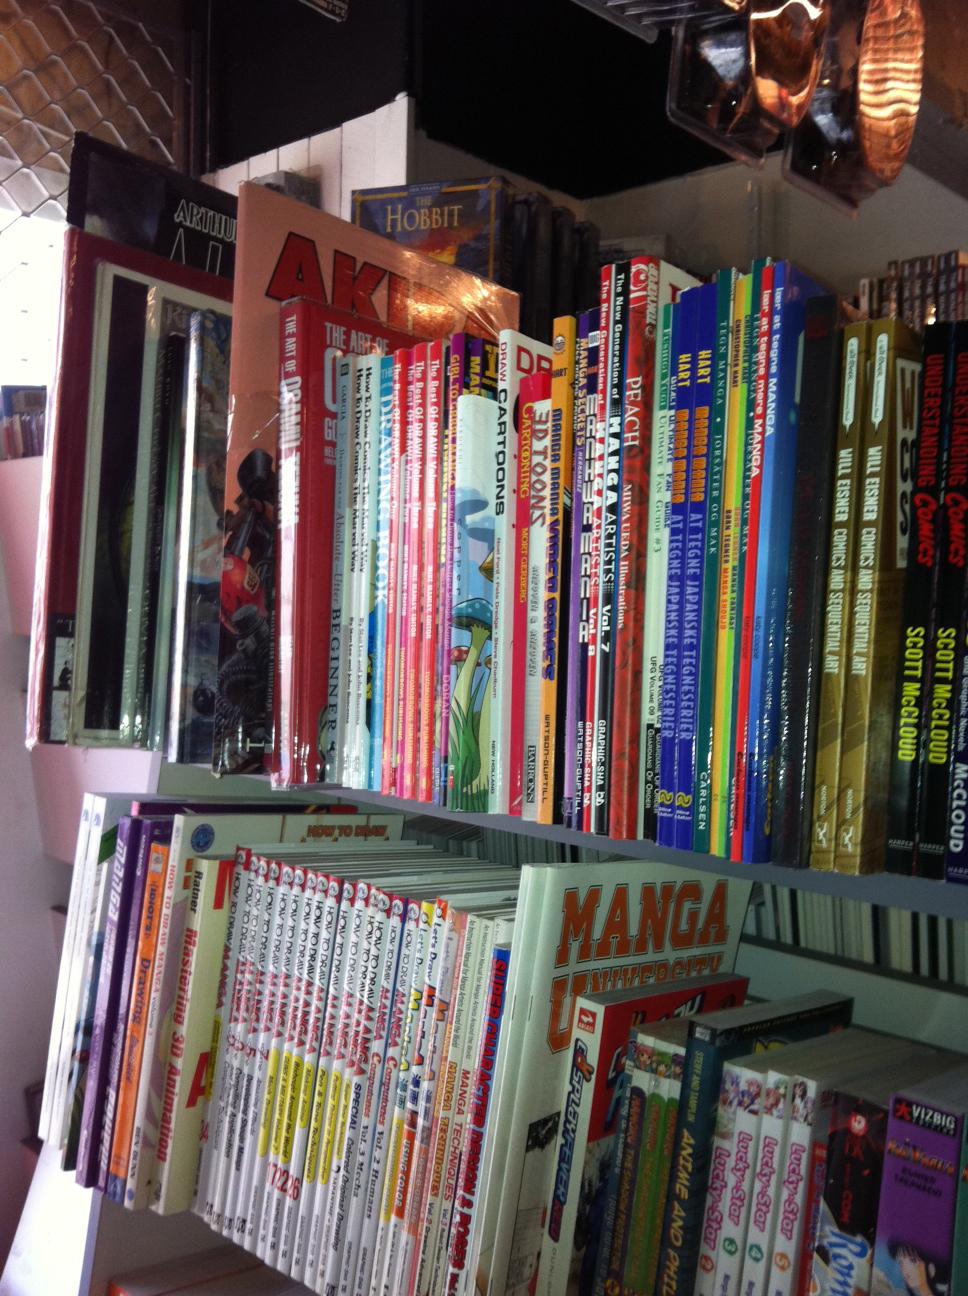 Danish comic book store in Aarhus